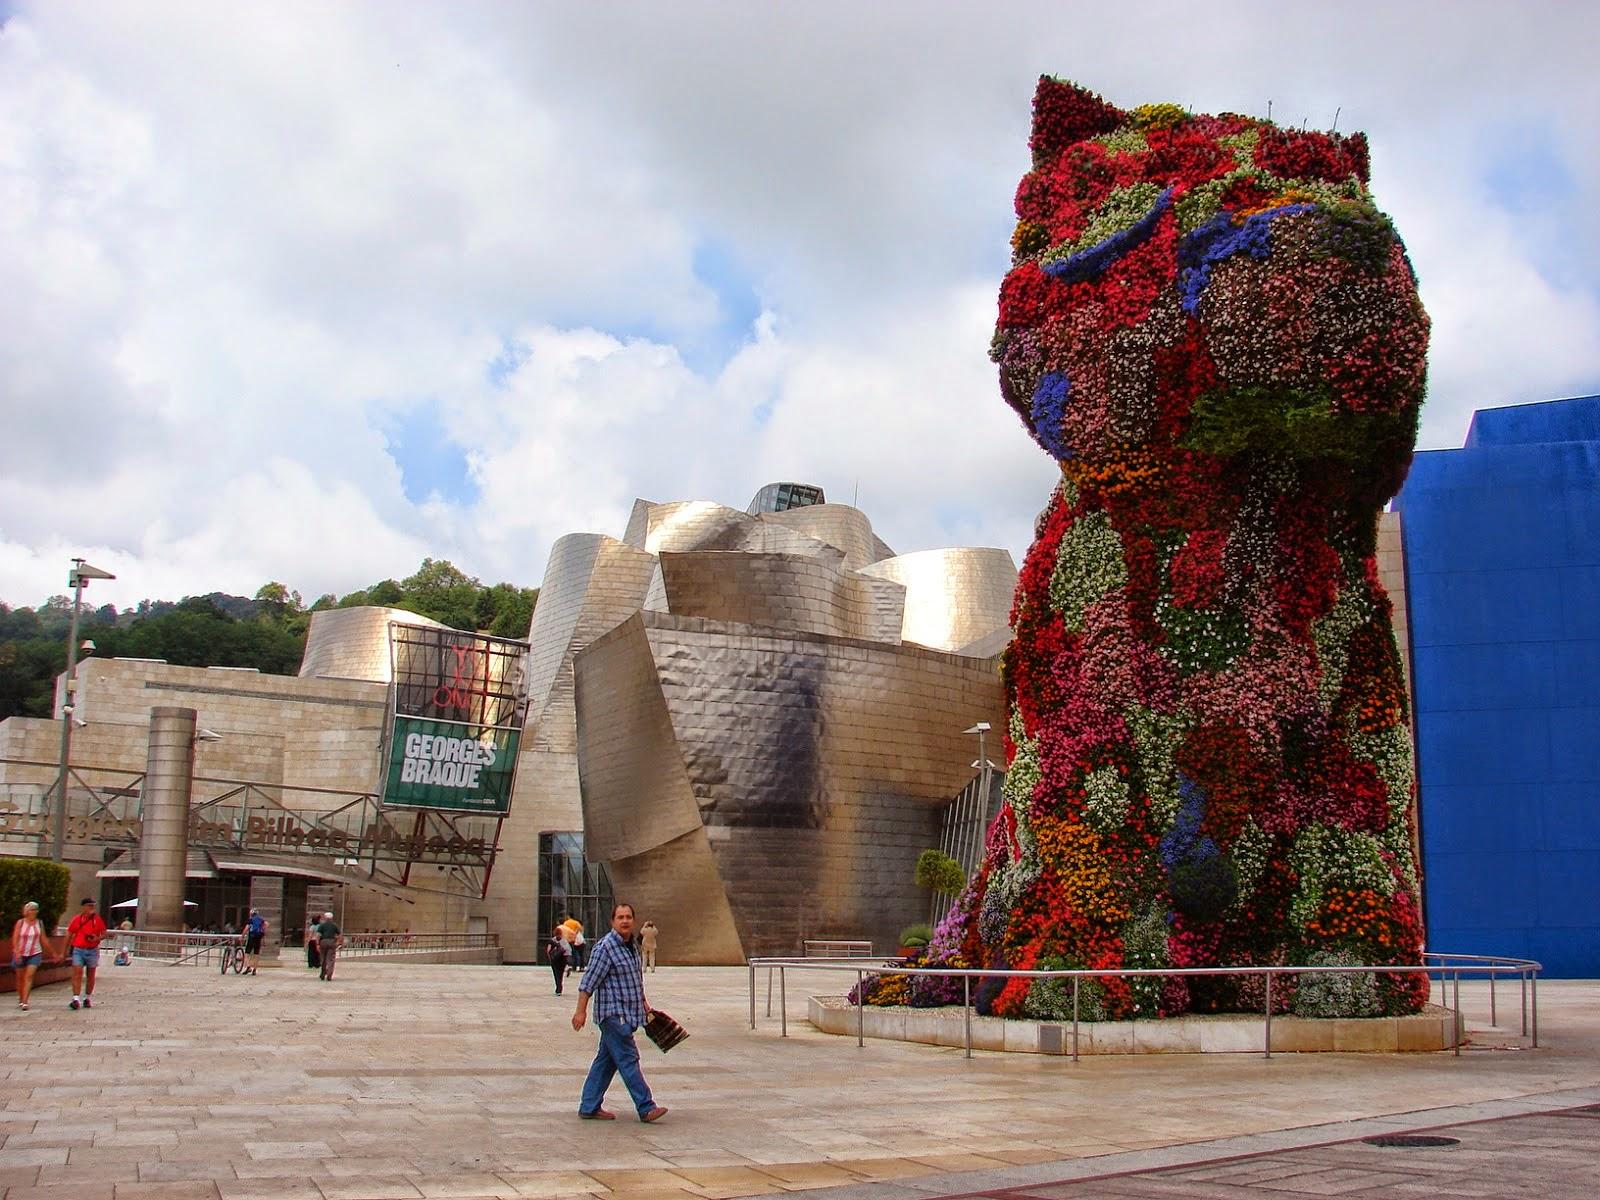 Barcelonaencamper paseo en autocaravana por el pais vasco - Arquitectura pais vasco ...